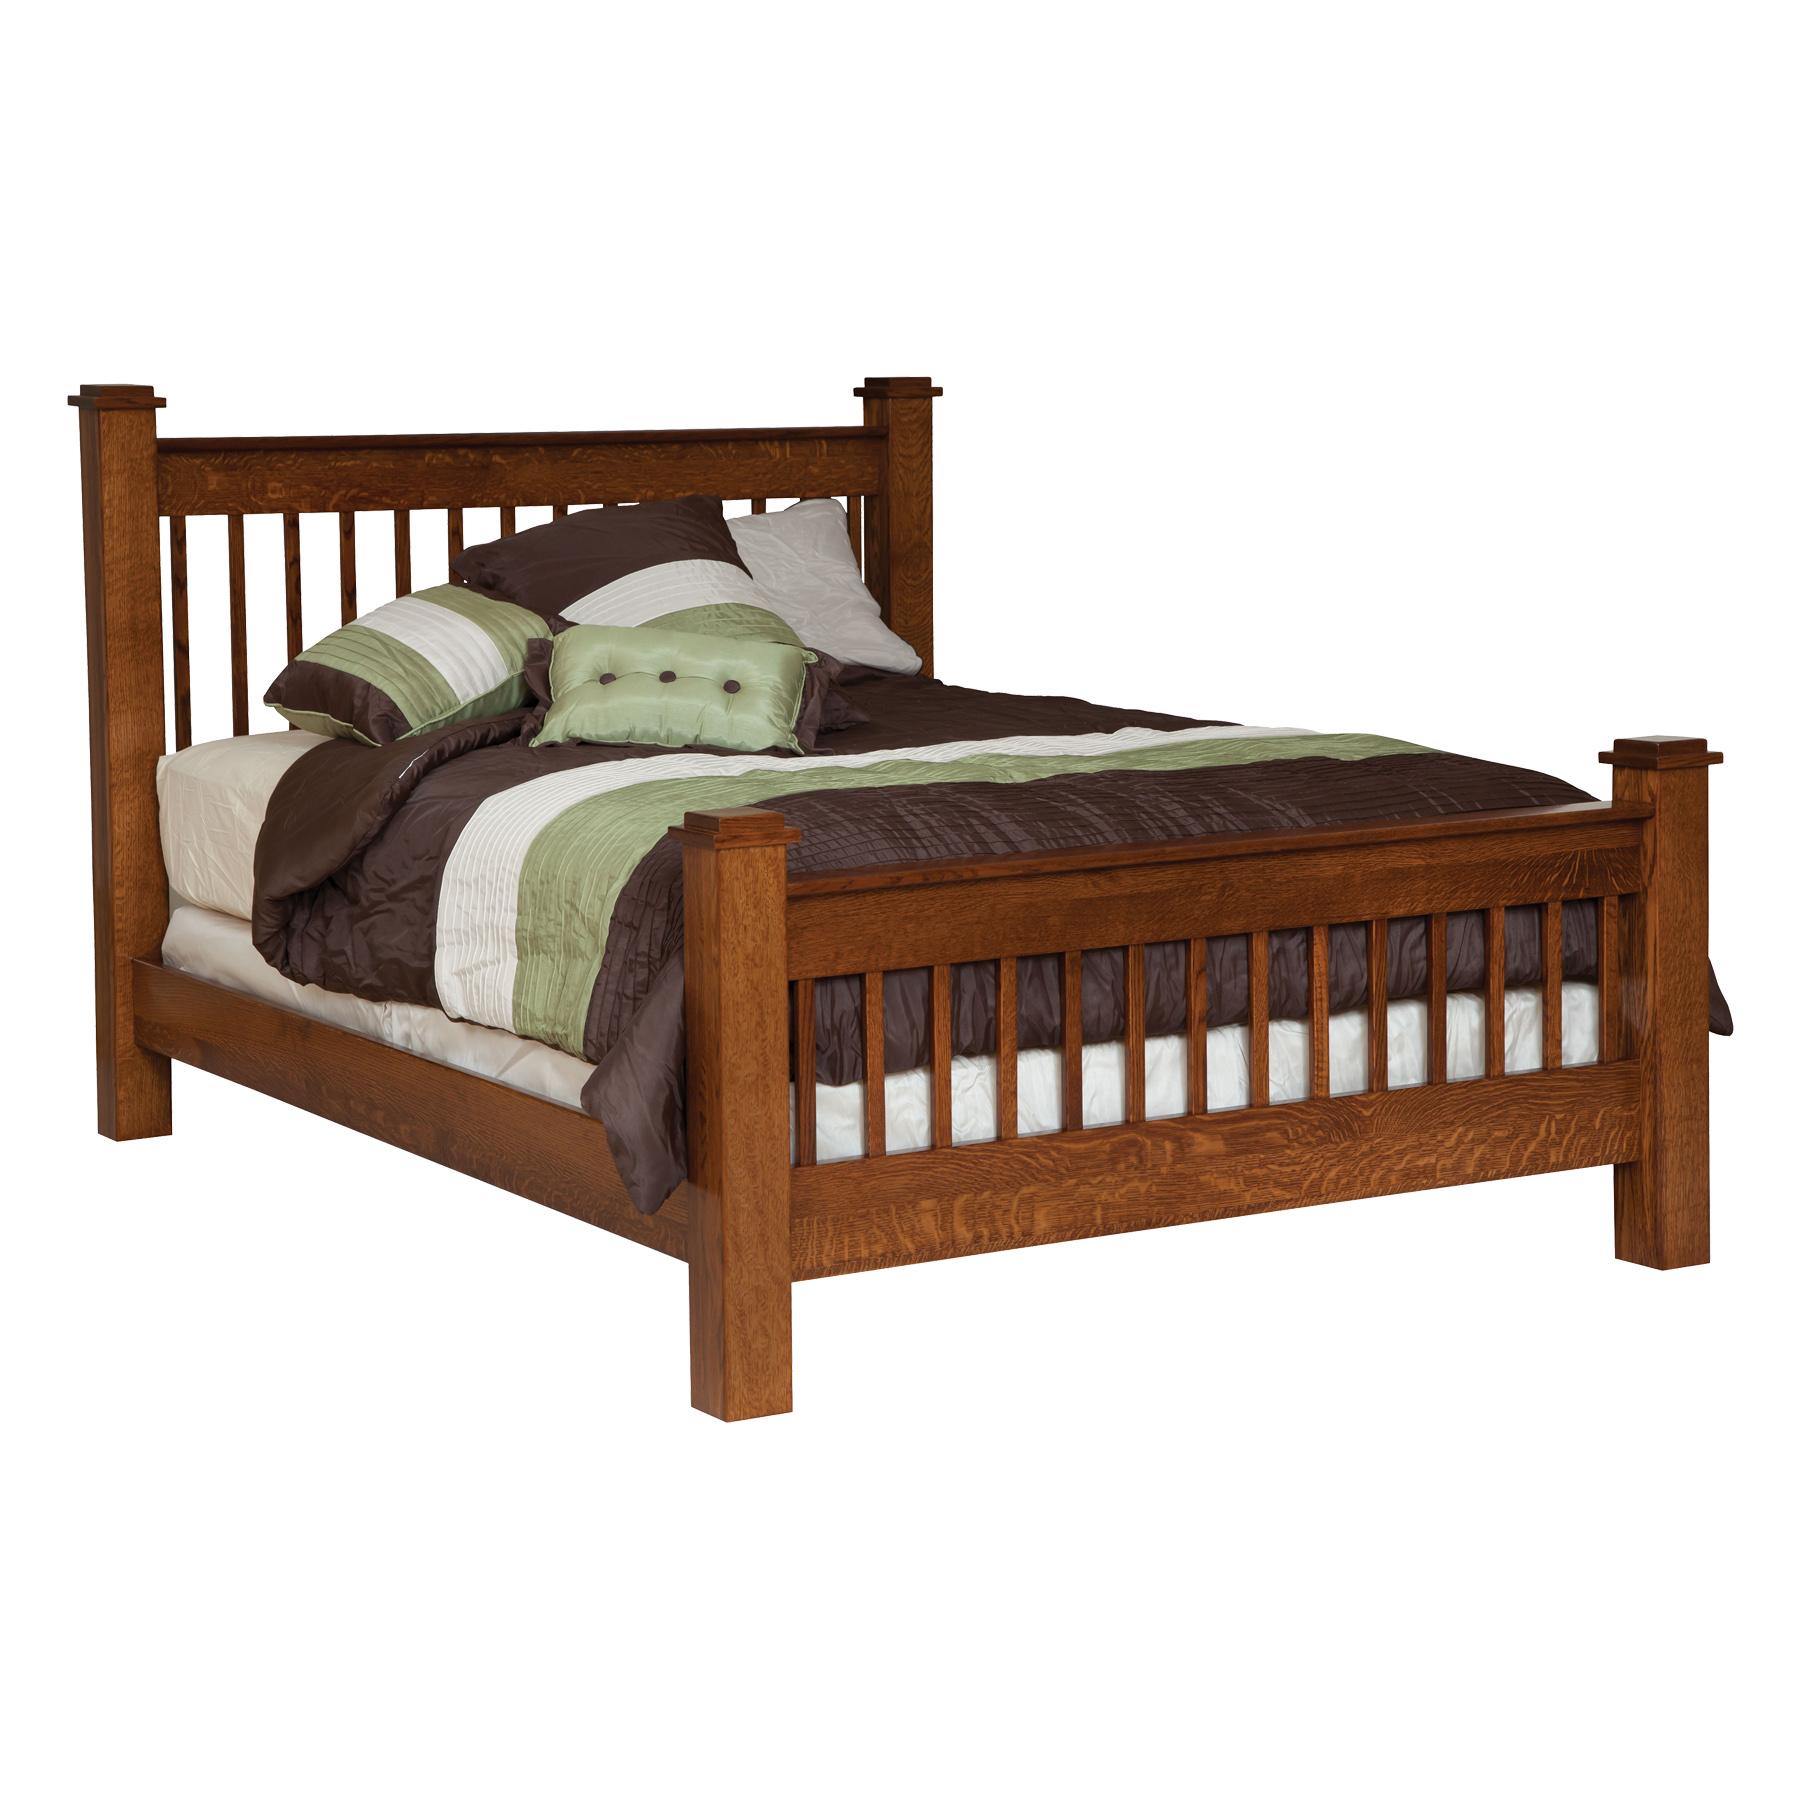 Michael's Mission Slat Bed